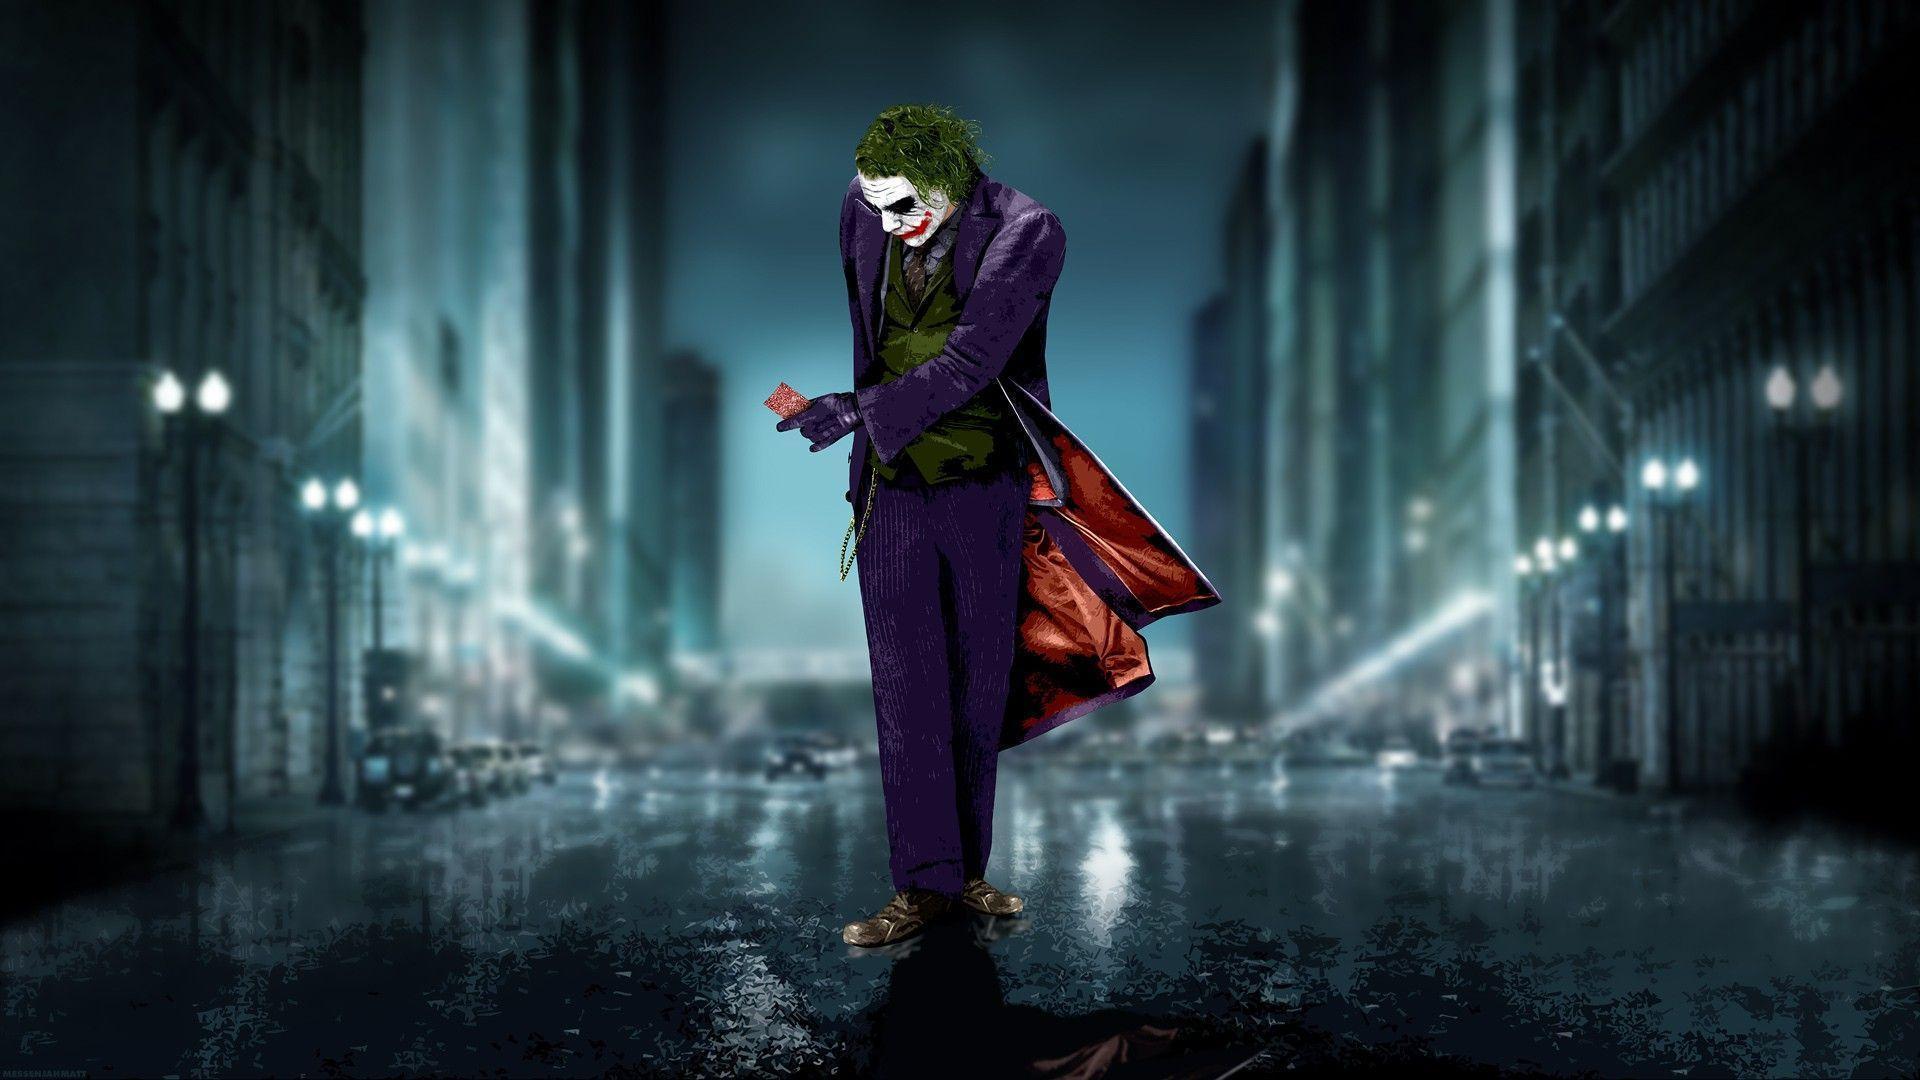 The Joker Wallpapers Wallpaper Cave